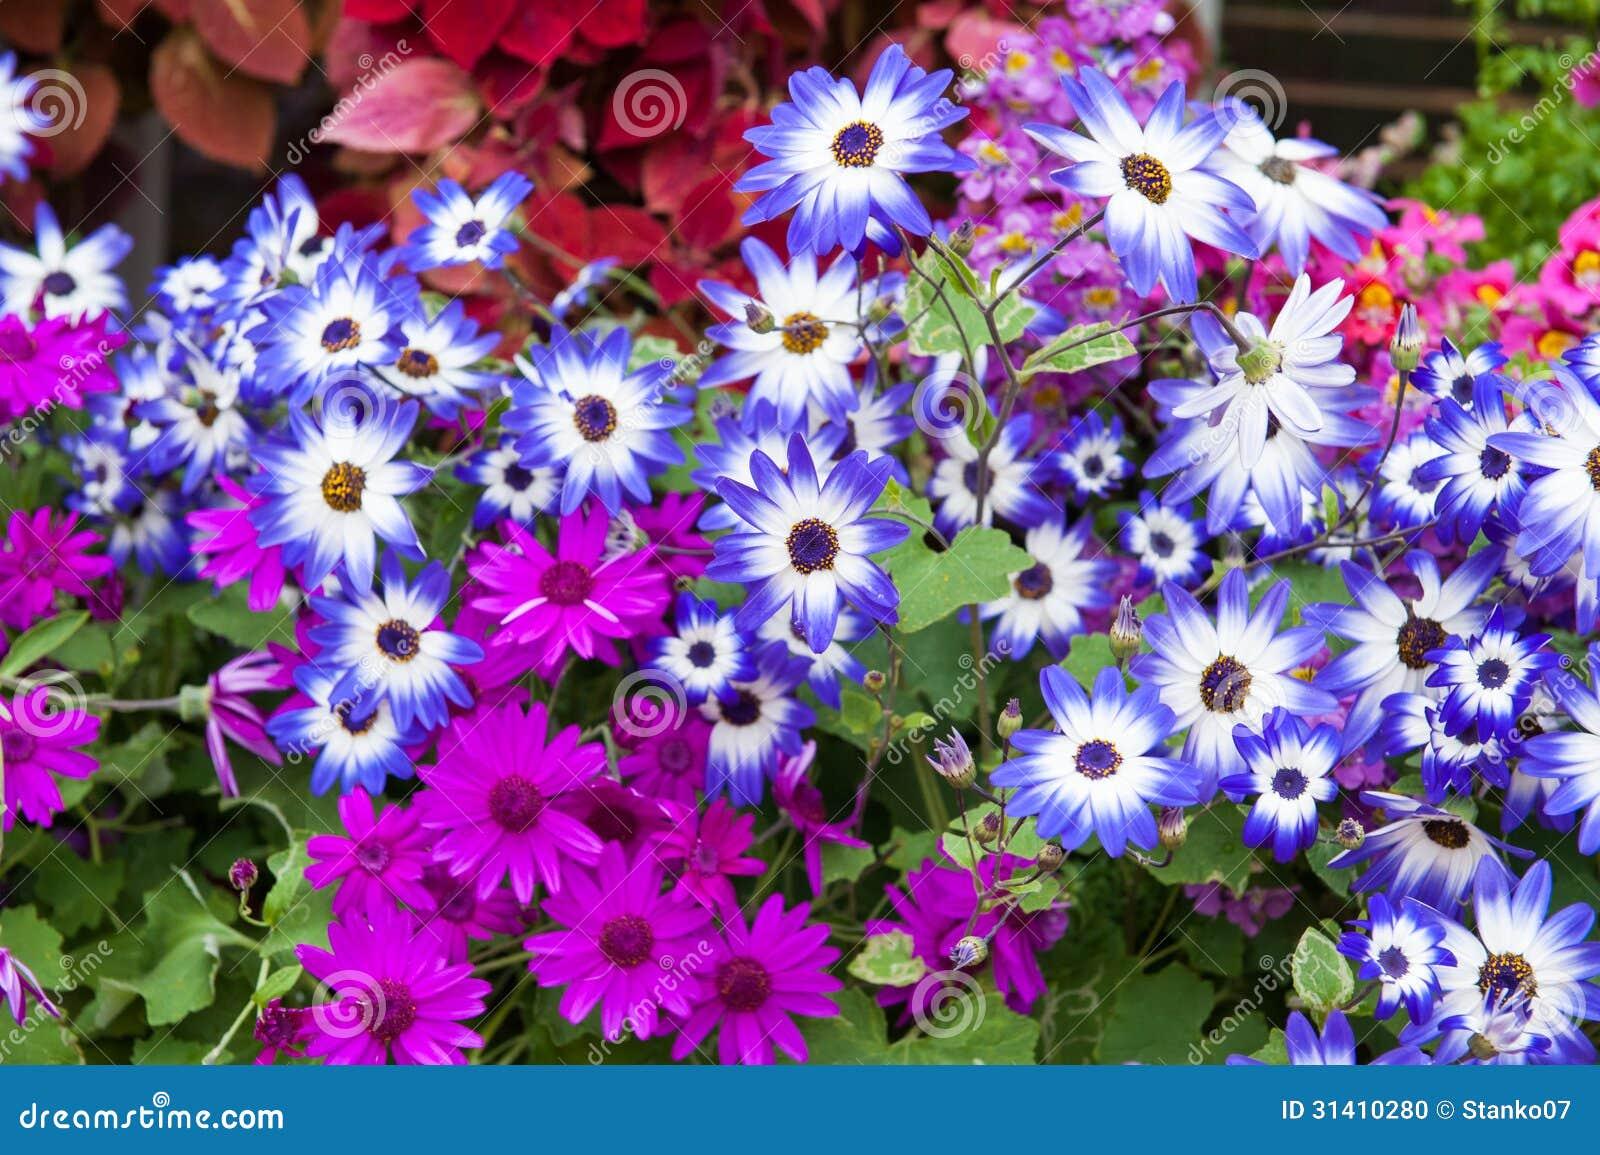 Marguerite Flowers Stock Photo Image 31410280